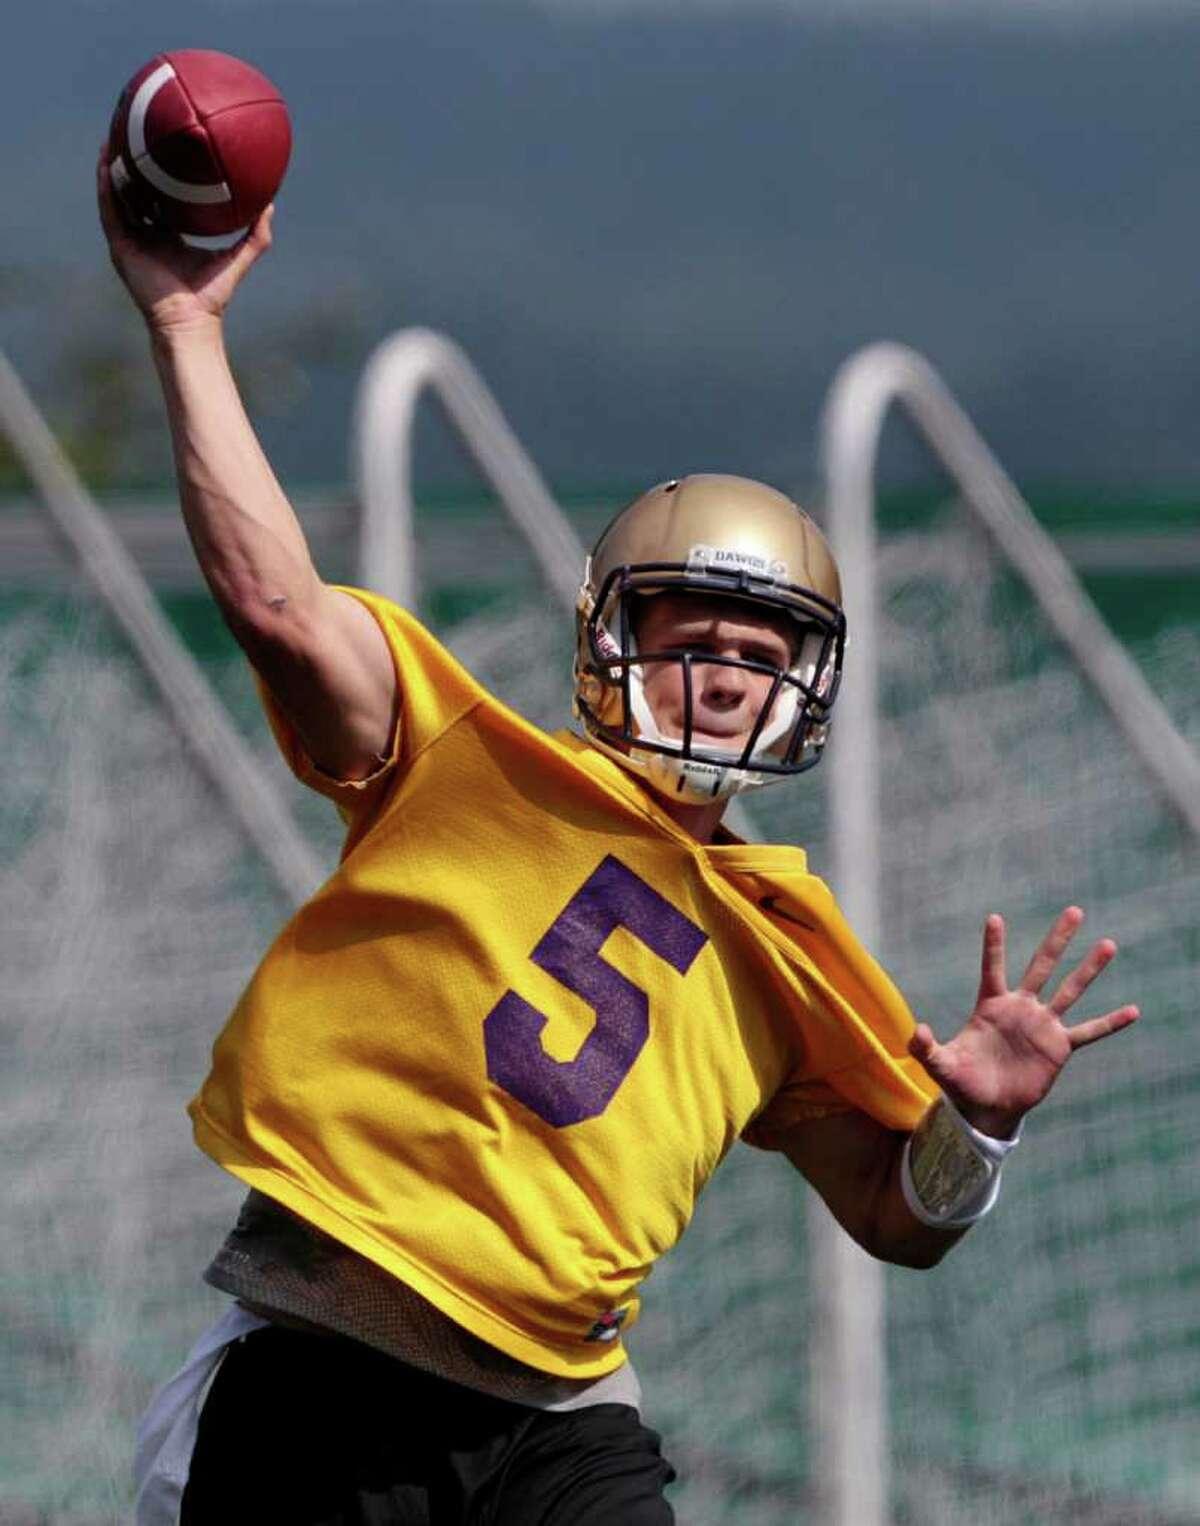 Washington quarterback Nick Montana throws during the NCAA college football team's first practice of the season, Monday, Aug. 8, 2011, in Seattle. (AP Photo/Elaine Thompson)